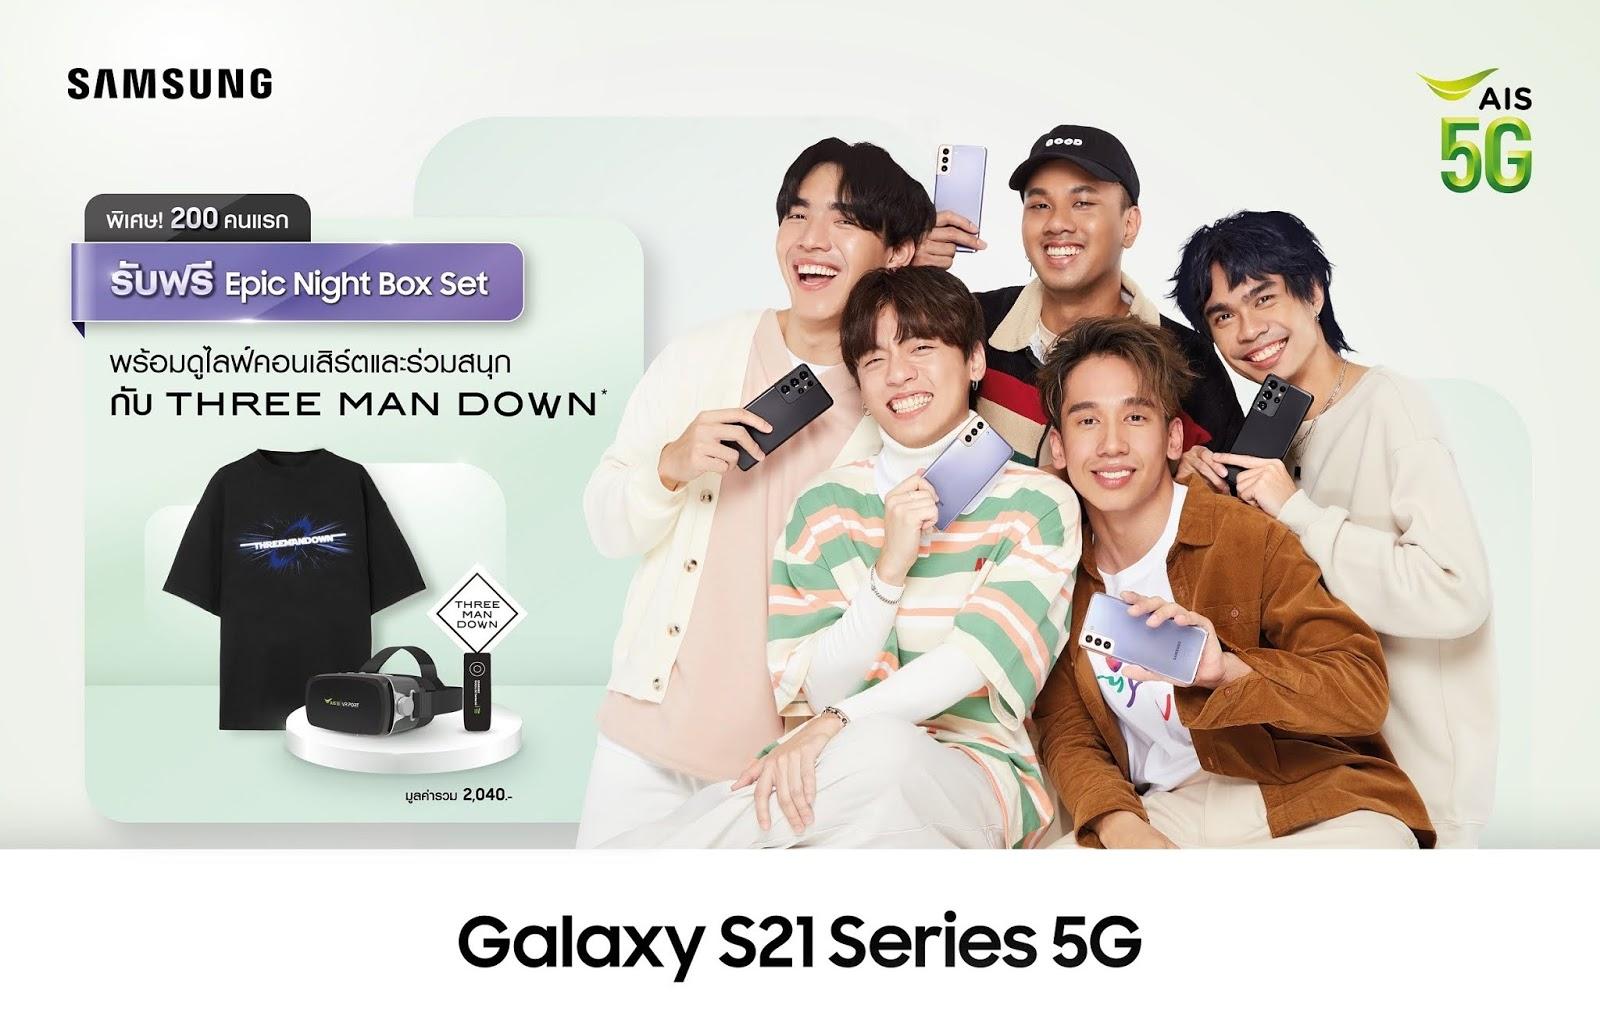 Samsung ร่วมมือ AIS ส่ง Epic Night Box Set เอาใจแฟนคลับ THREE MAN DOWN เฉพาะผู้ซื้อ Galaxy S21 Series 5G จำกัด 200 เซ็ตเท่านั้น!